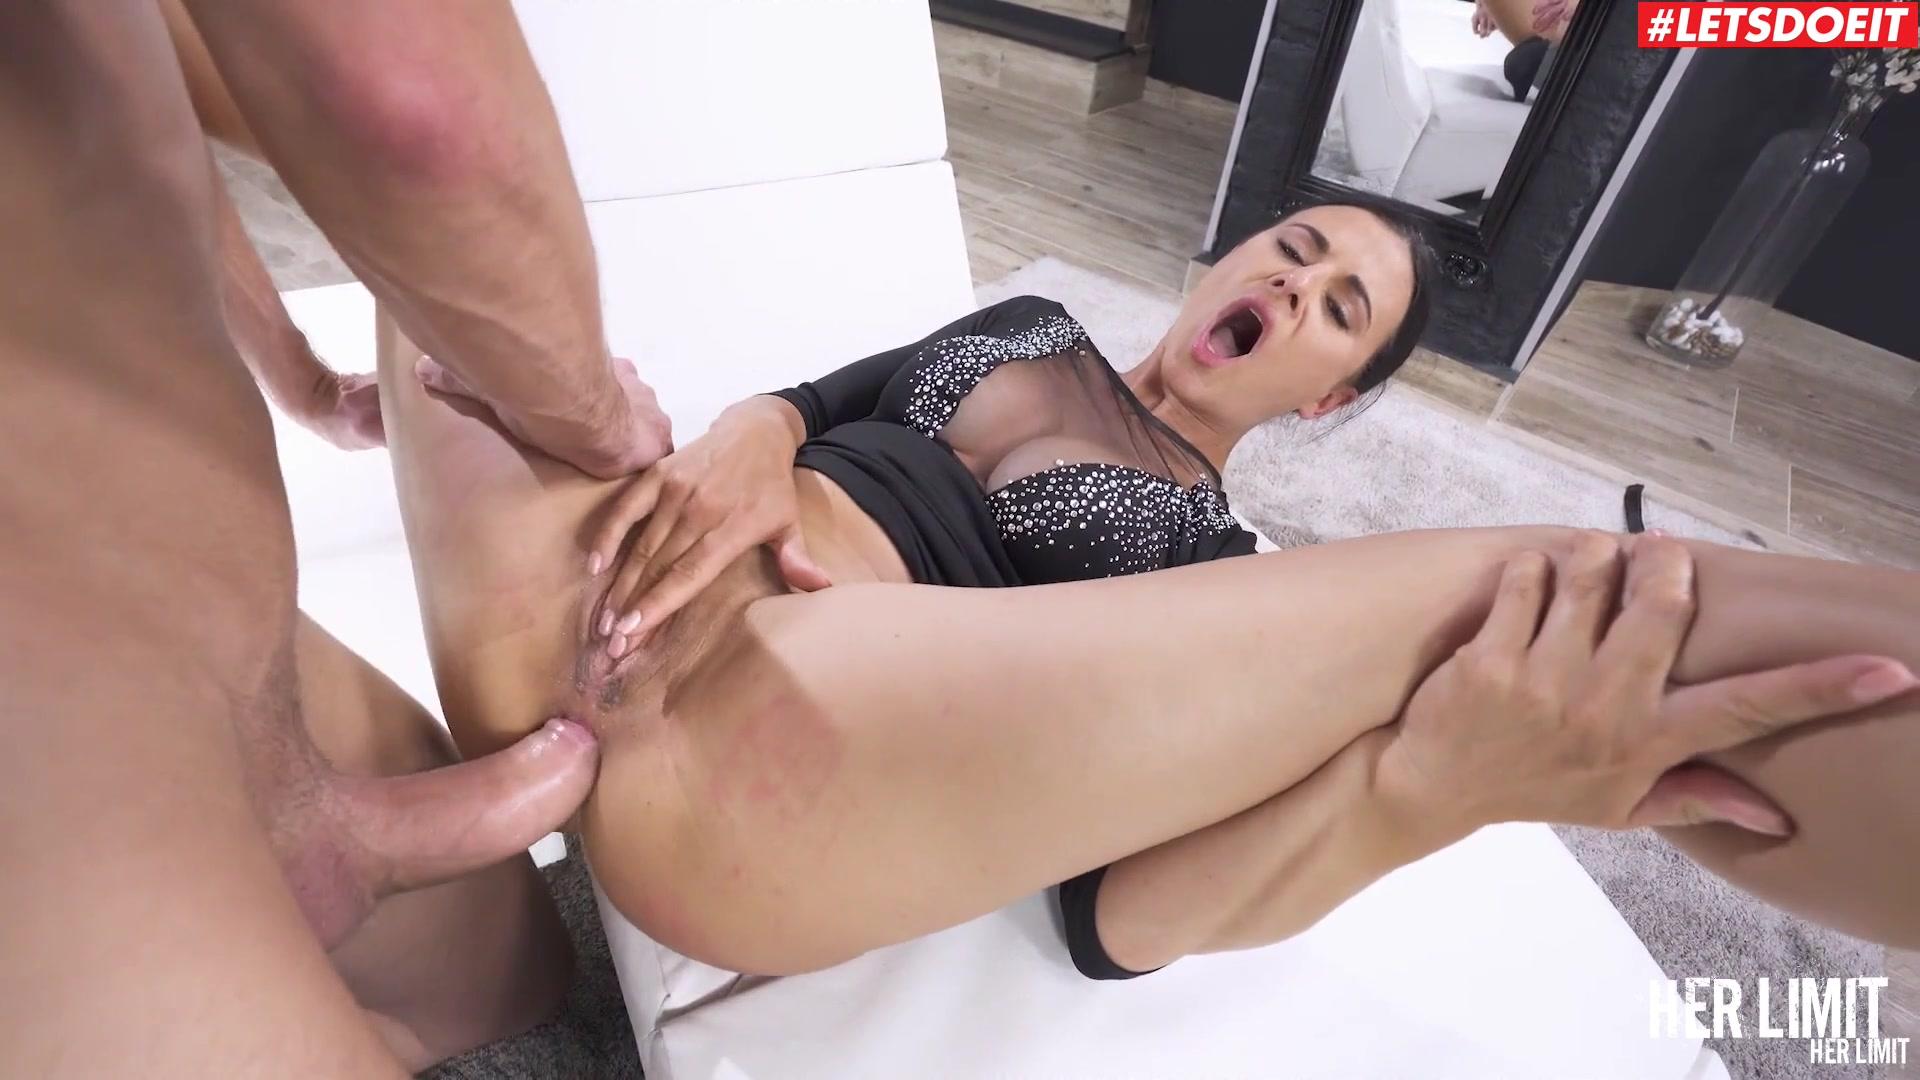 Adult videos Hot latina lesbian video